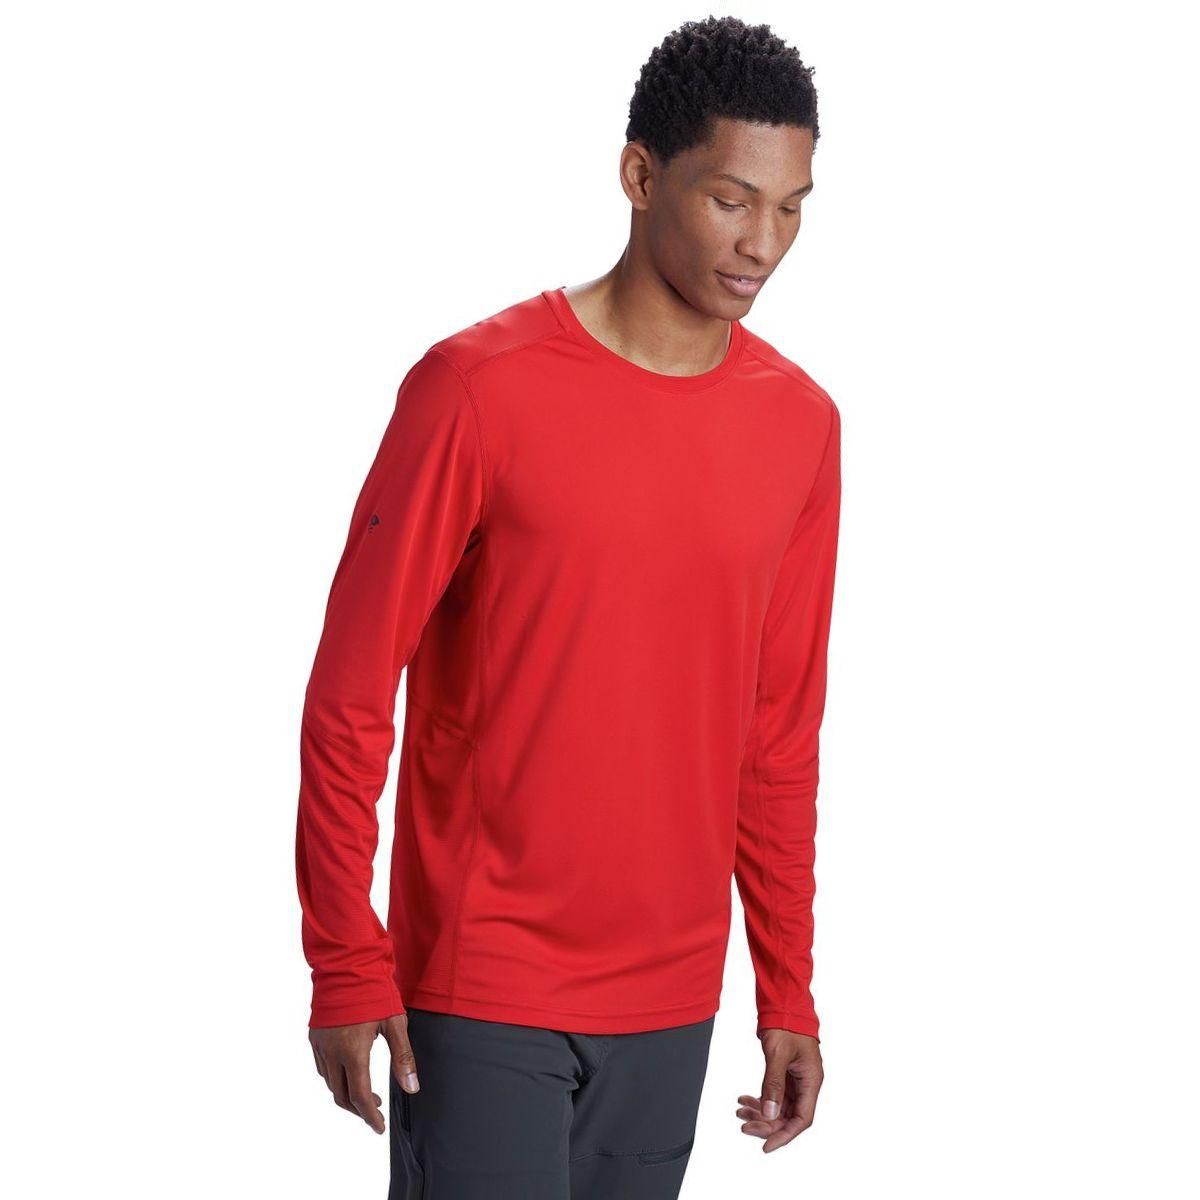 Mountain Hardwear Photon Long-Sleeve Shirt - Men's